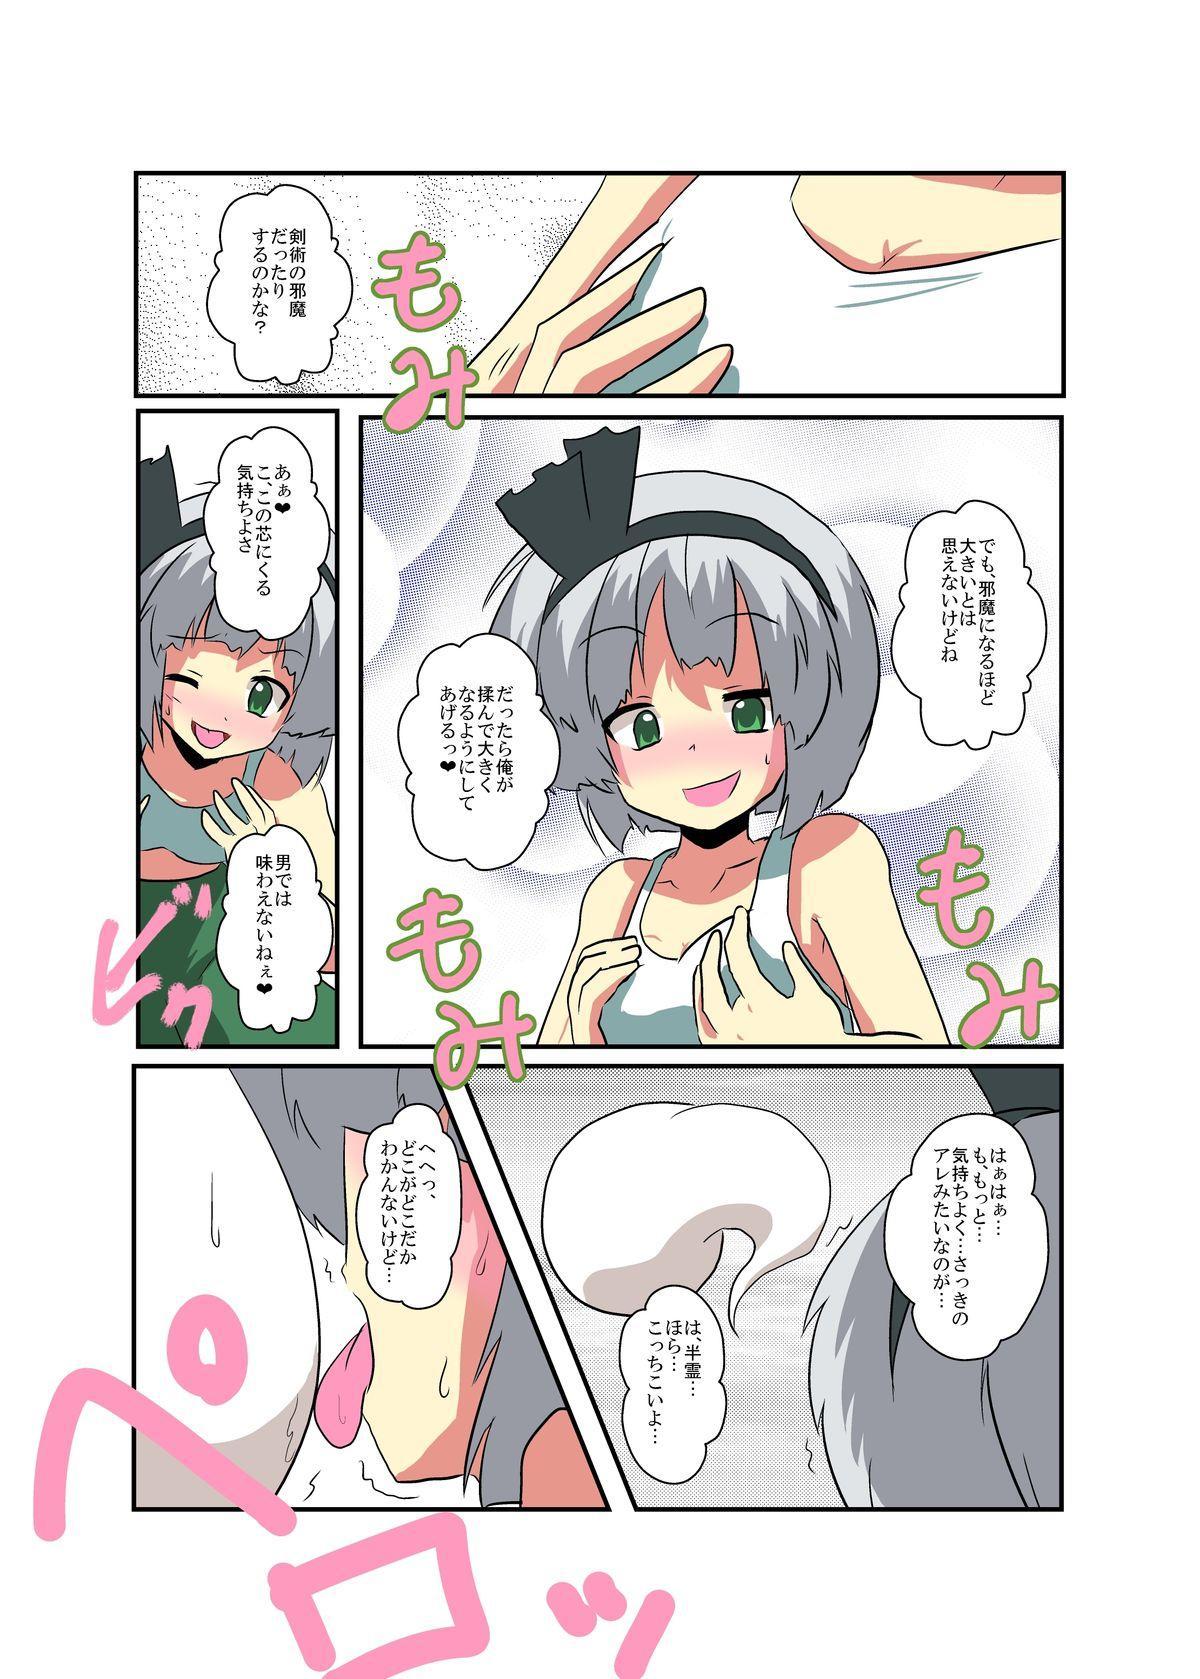 Touhou TS monogatari 14